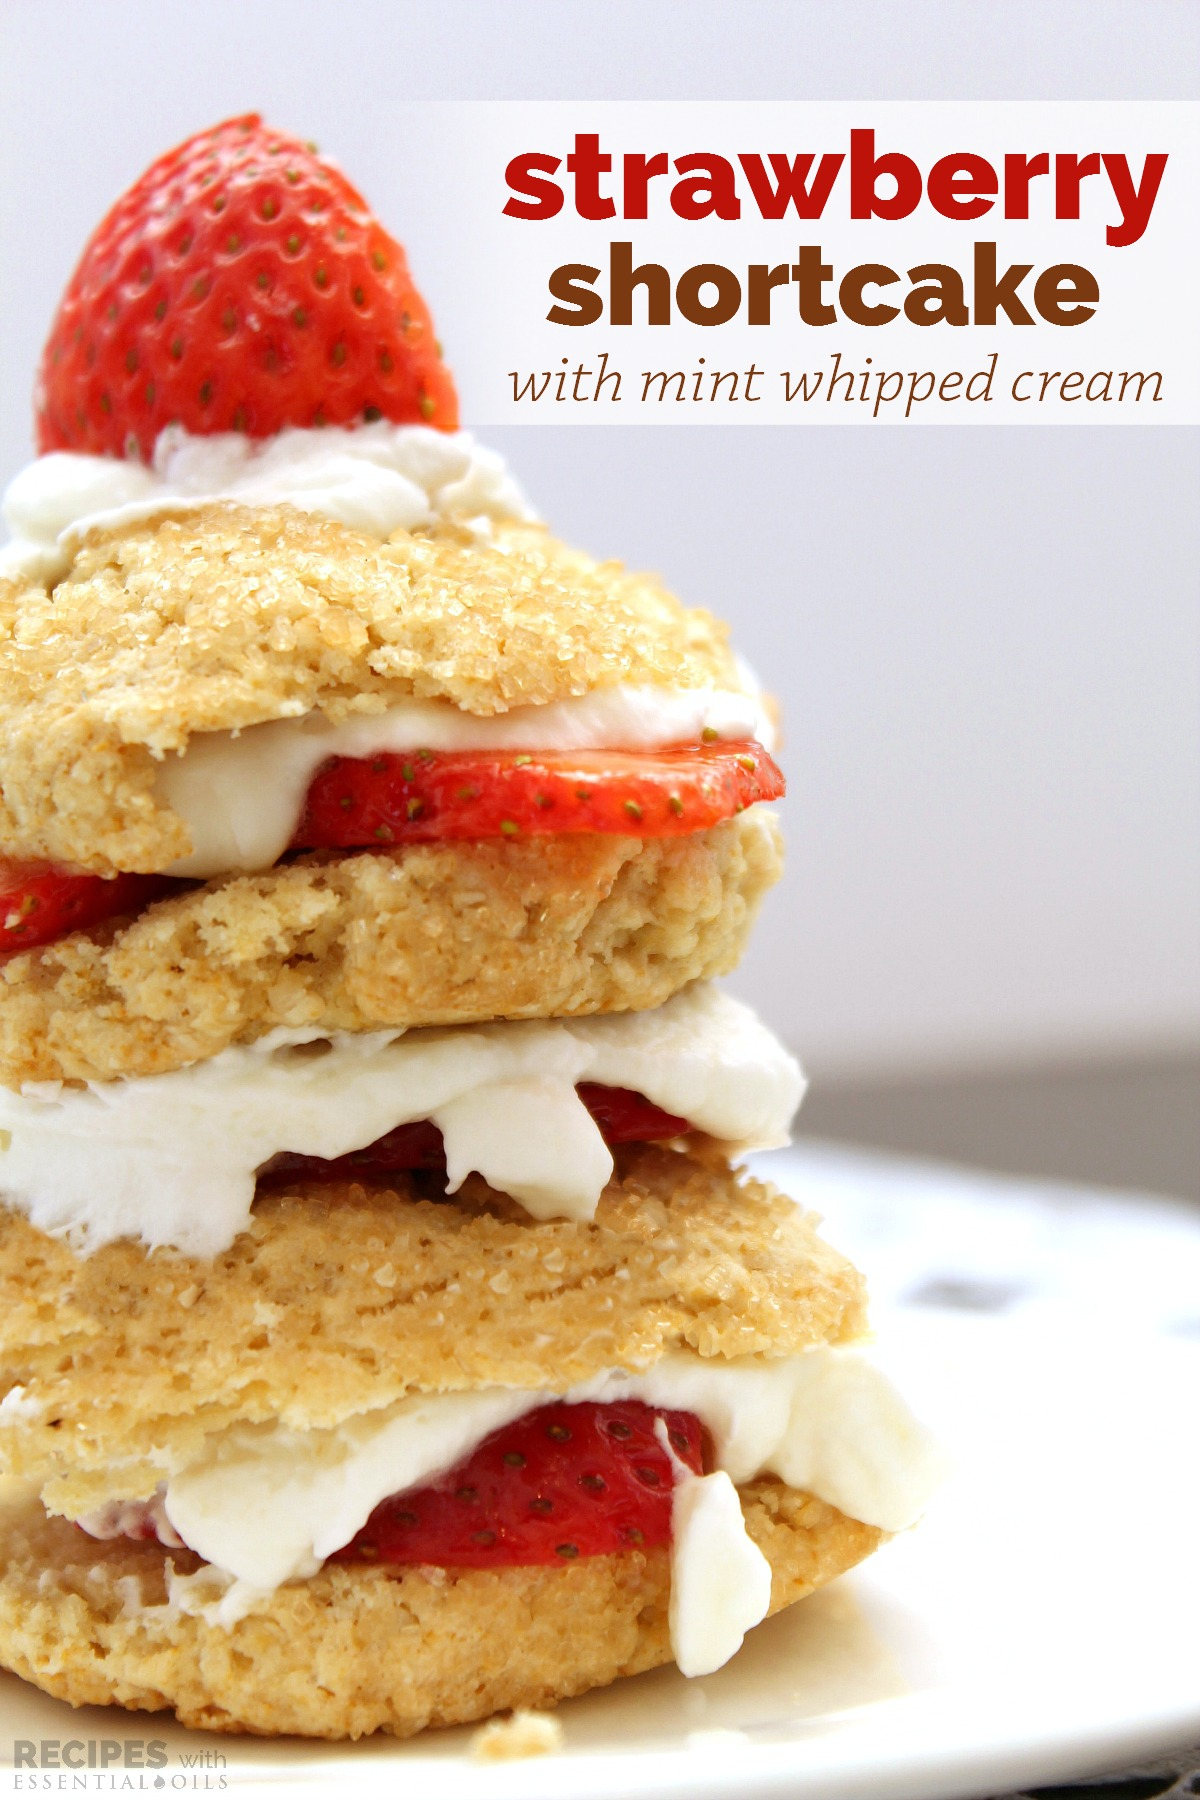 Jazzed up strawberry shortcake recipes with essential oils jazzed up strawberry shortcake recipe with vitality essential oils from recipeswithessentialoils fandeluxe Images